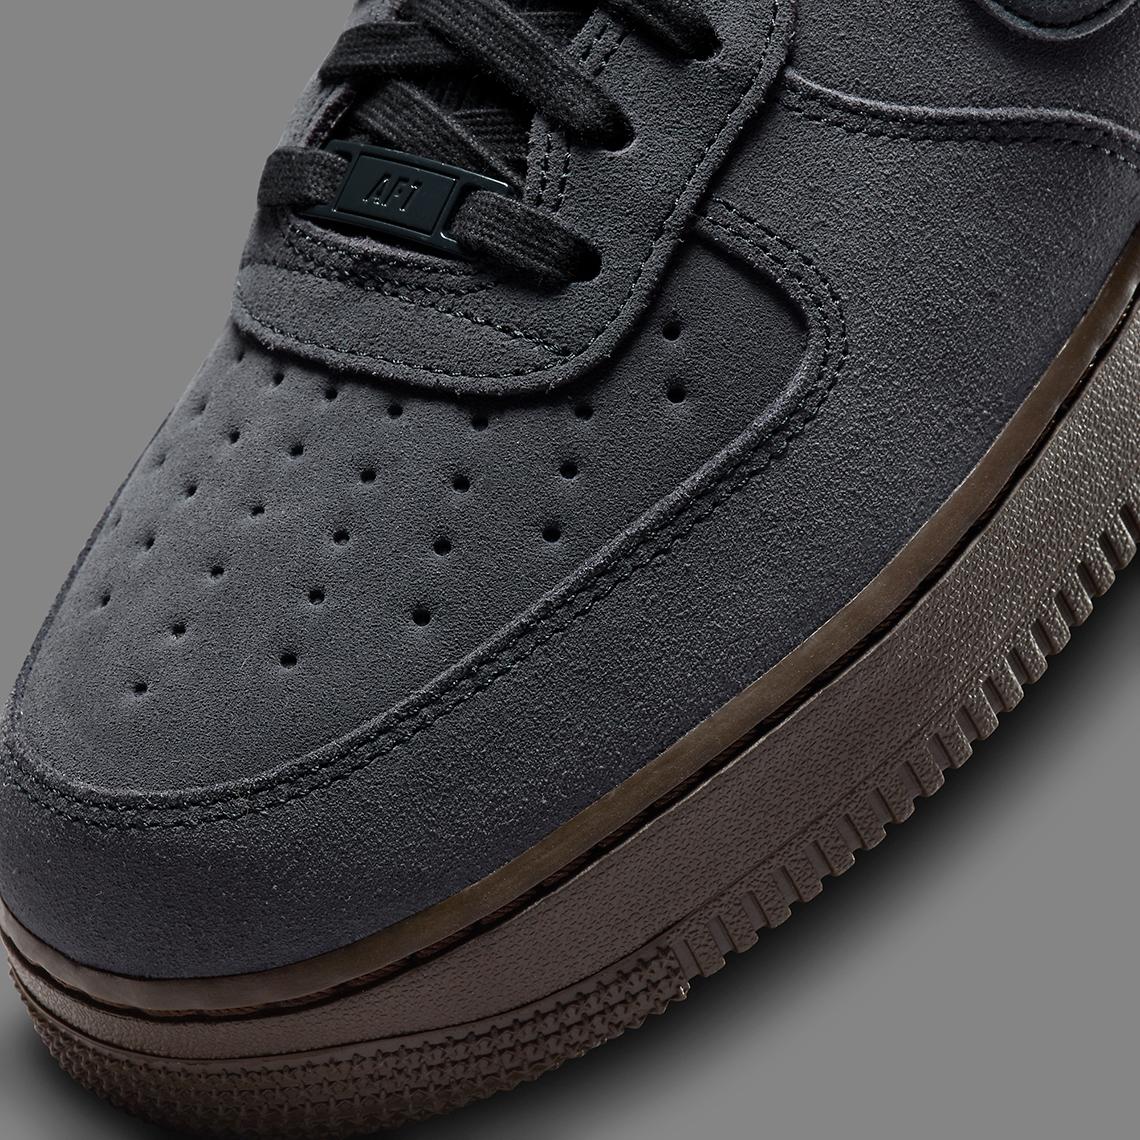 Nike Air Force 1 Off Noir Dark Chocolate Black DO6730-001 ...